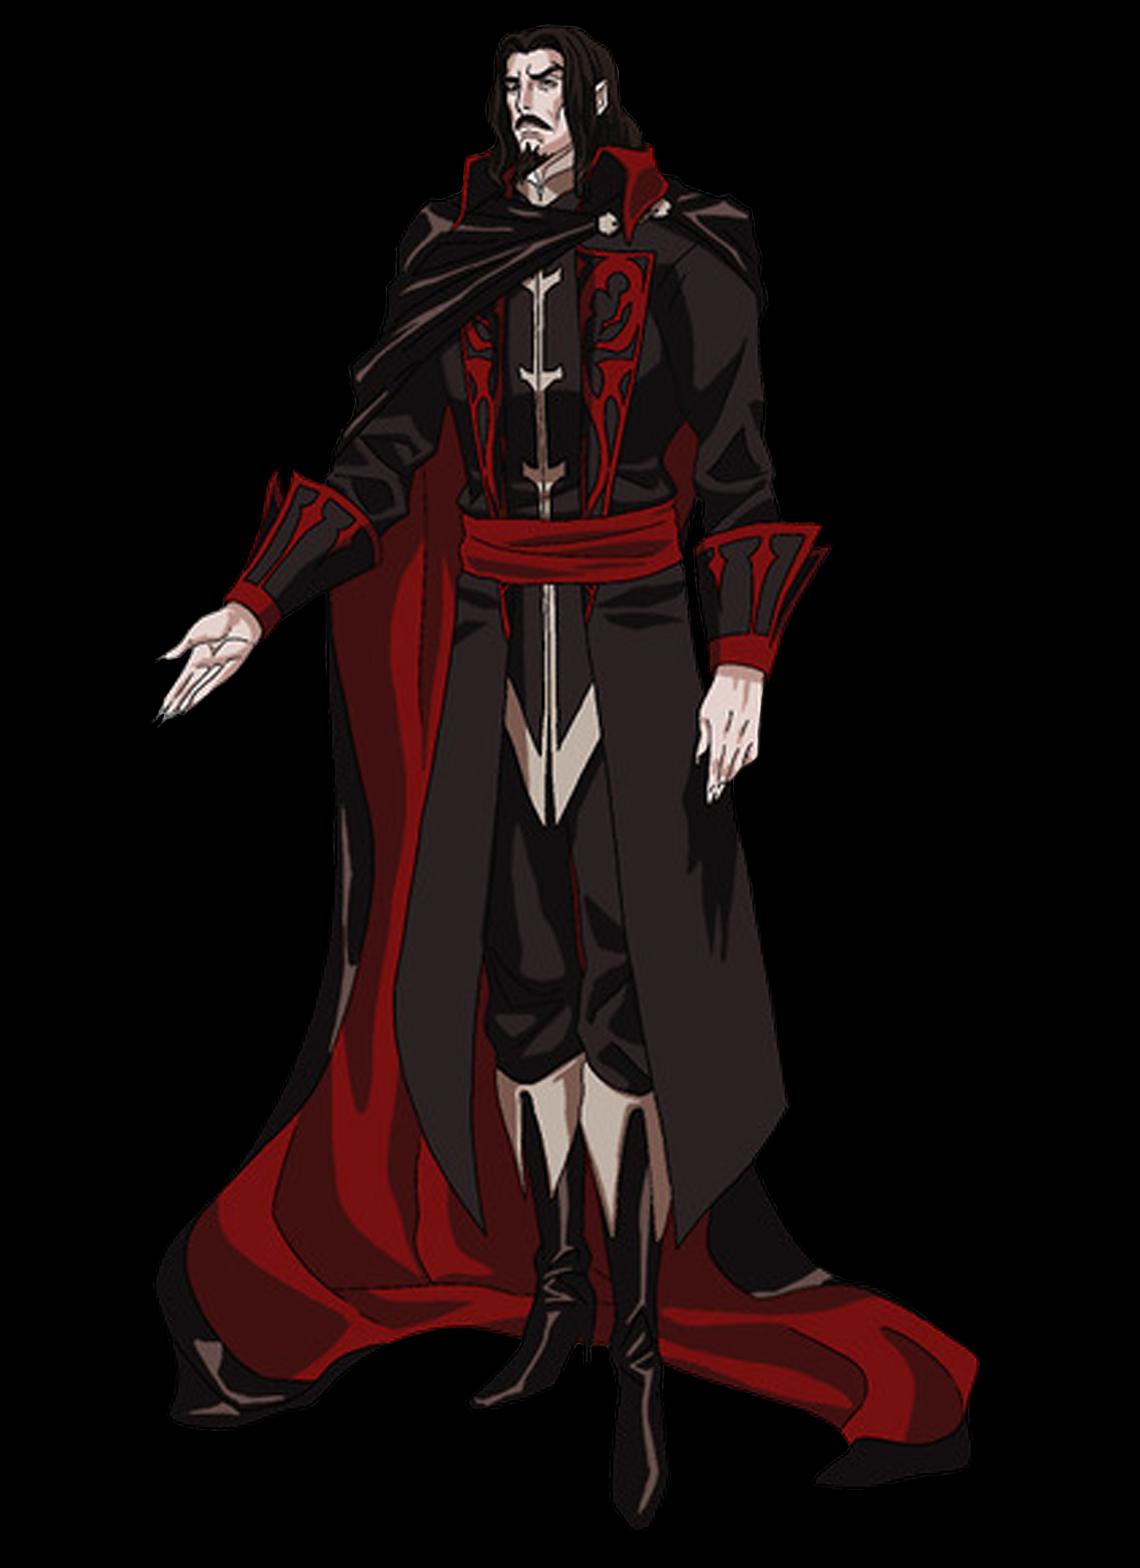 Dracula (Netflix's Castlevania)